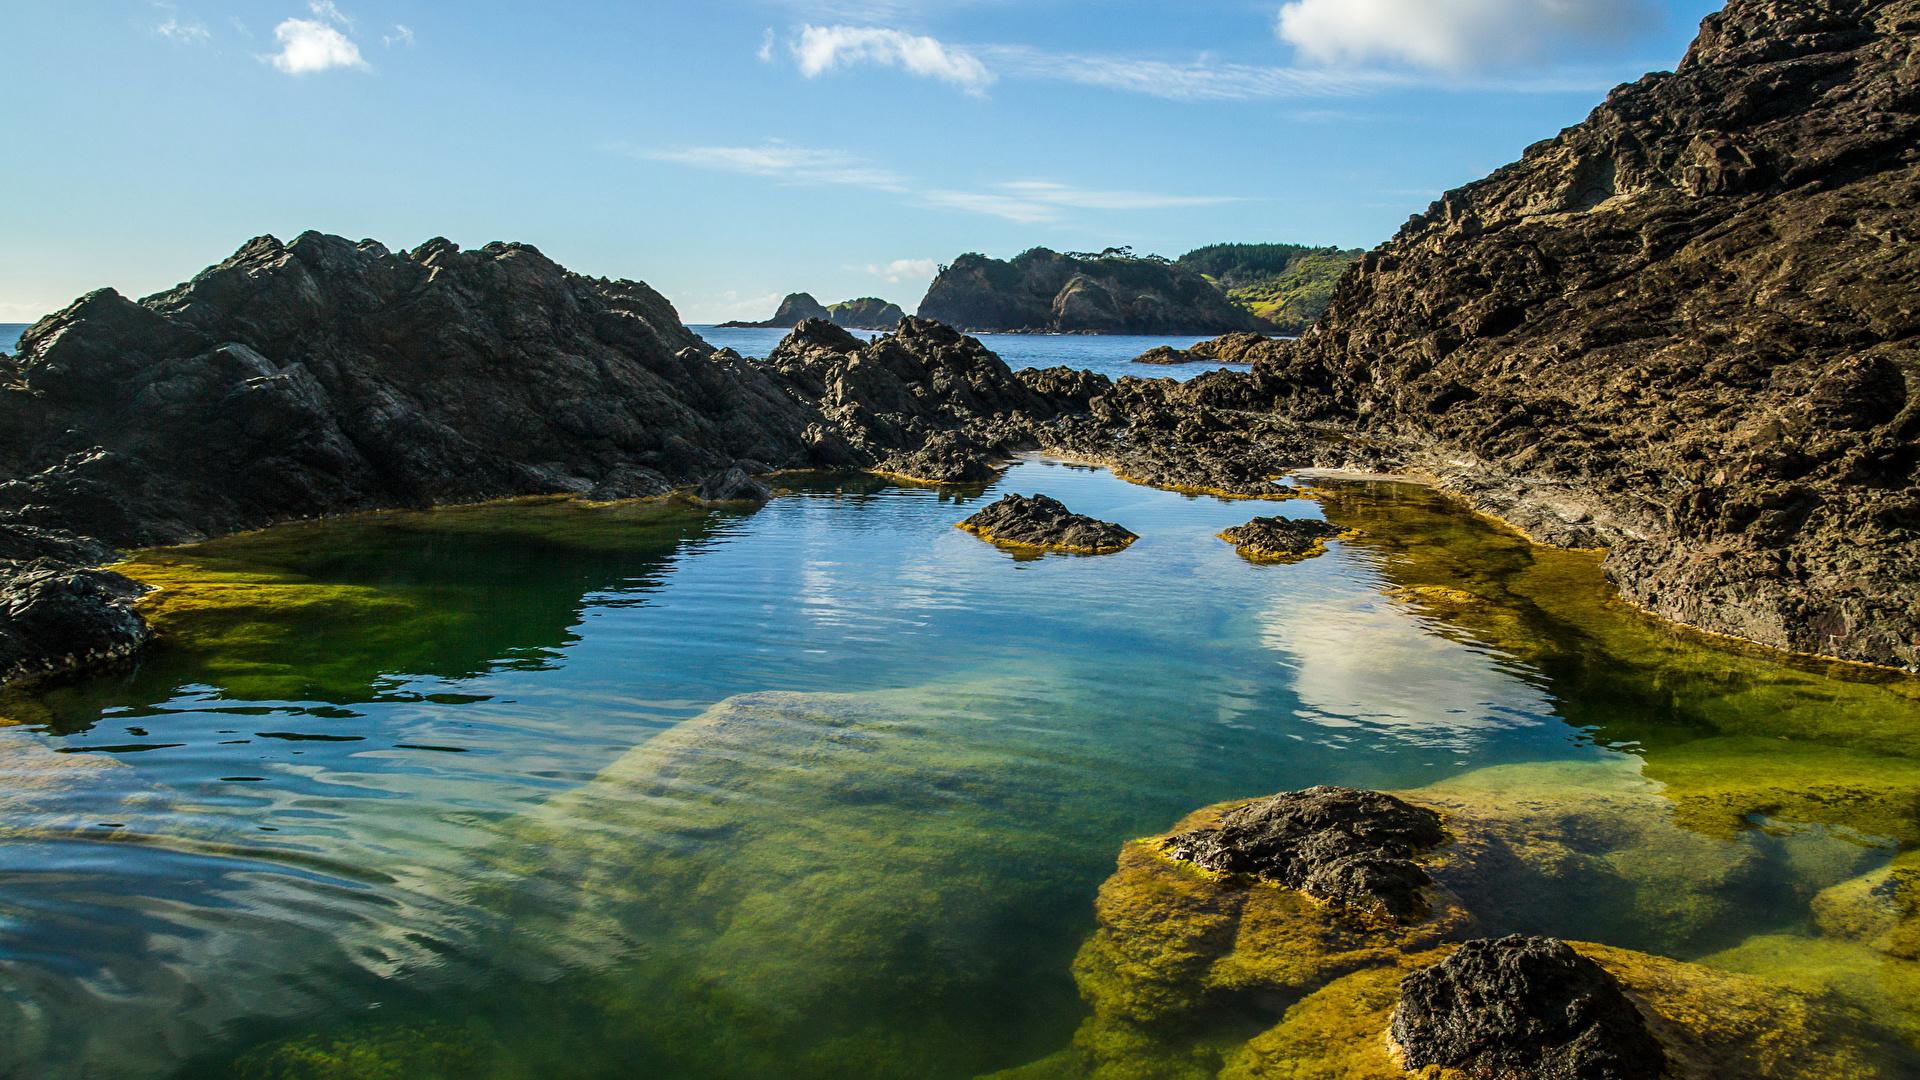 Новая зеландия Hd: Картинки Новая Зеландия Whangarei Скала Природа Небо 1920x1080